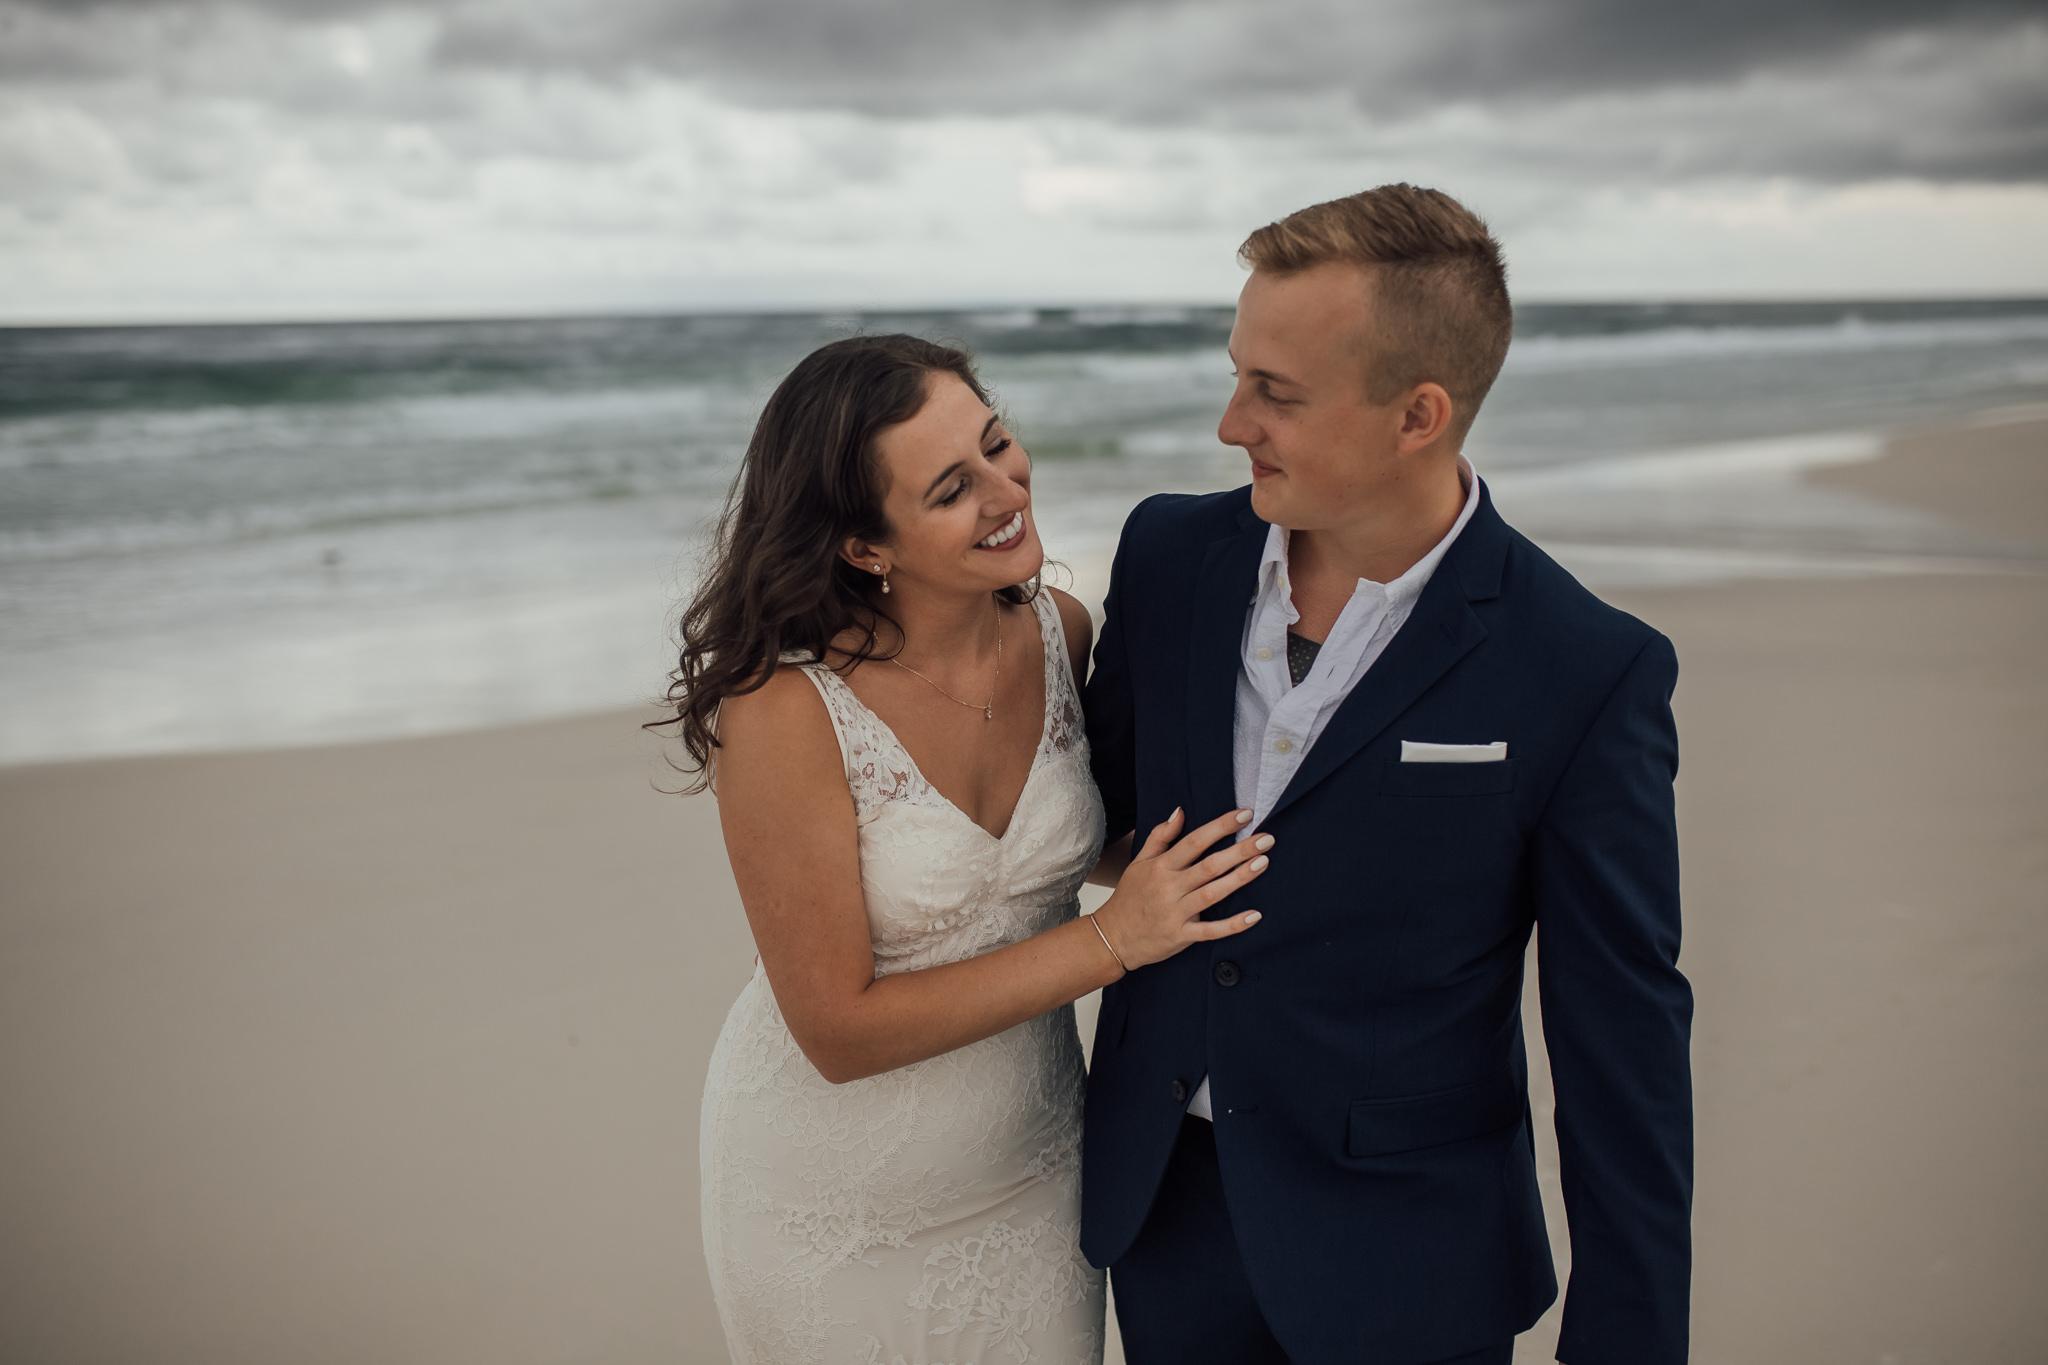 cassie-cook-photography-santa-rosa-beach-wedding-farrar-wedding-52.jpg